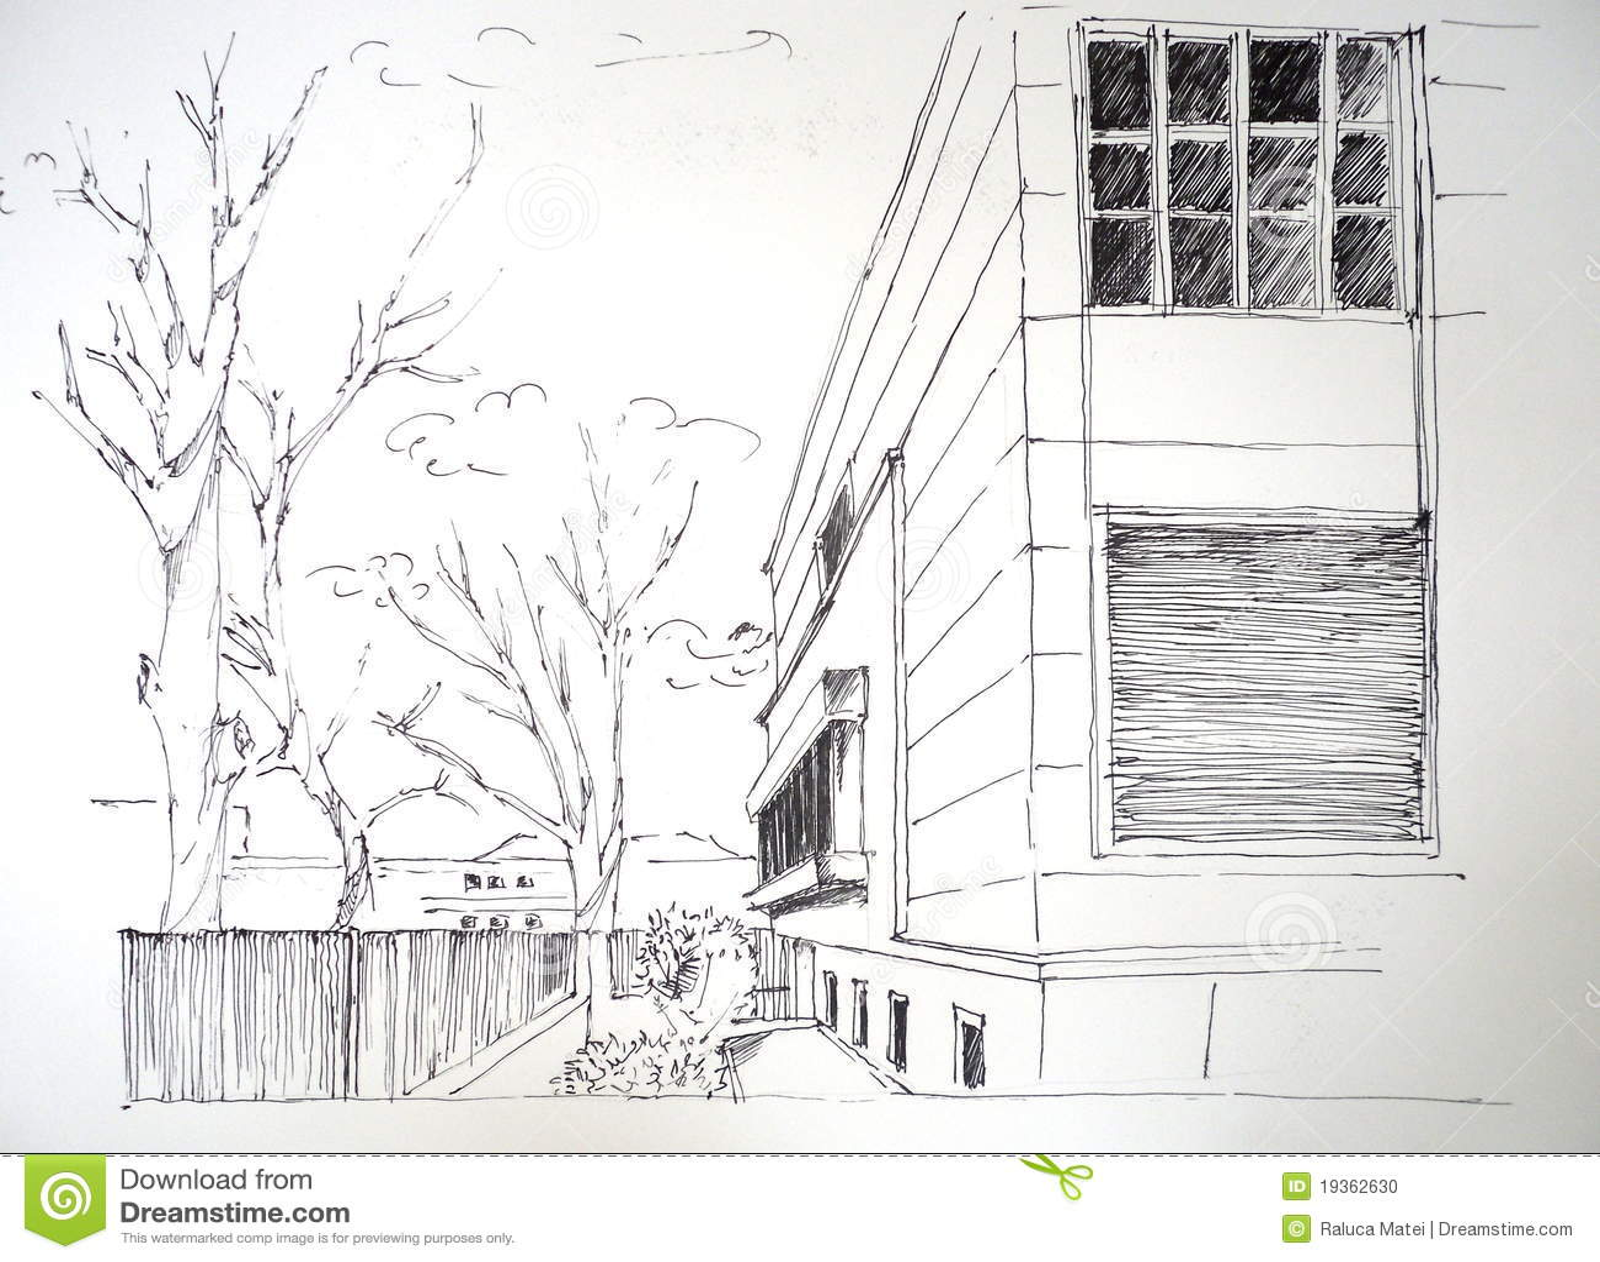 Haus skizze stockfoto bild 19362630 for Modernes haus skizze